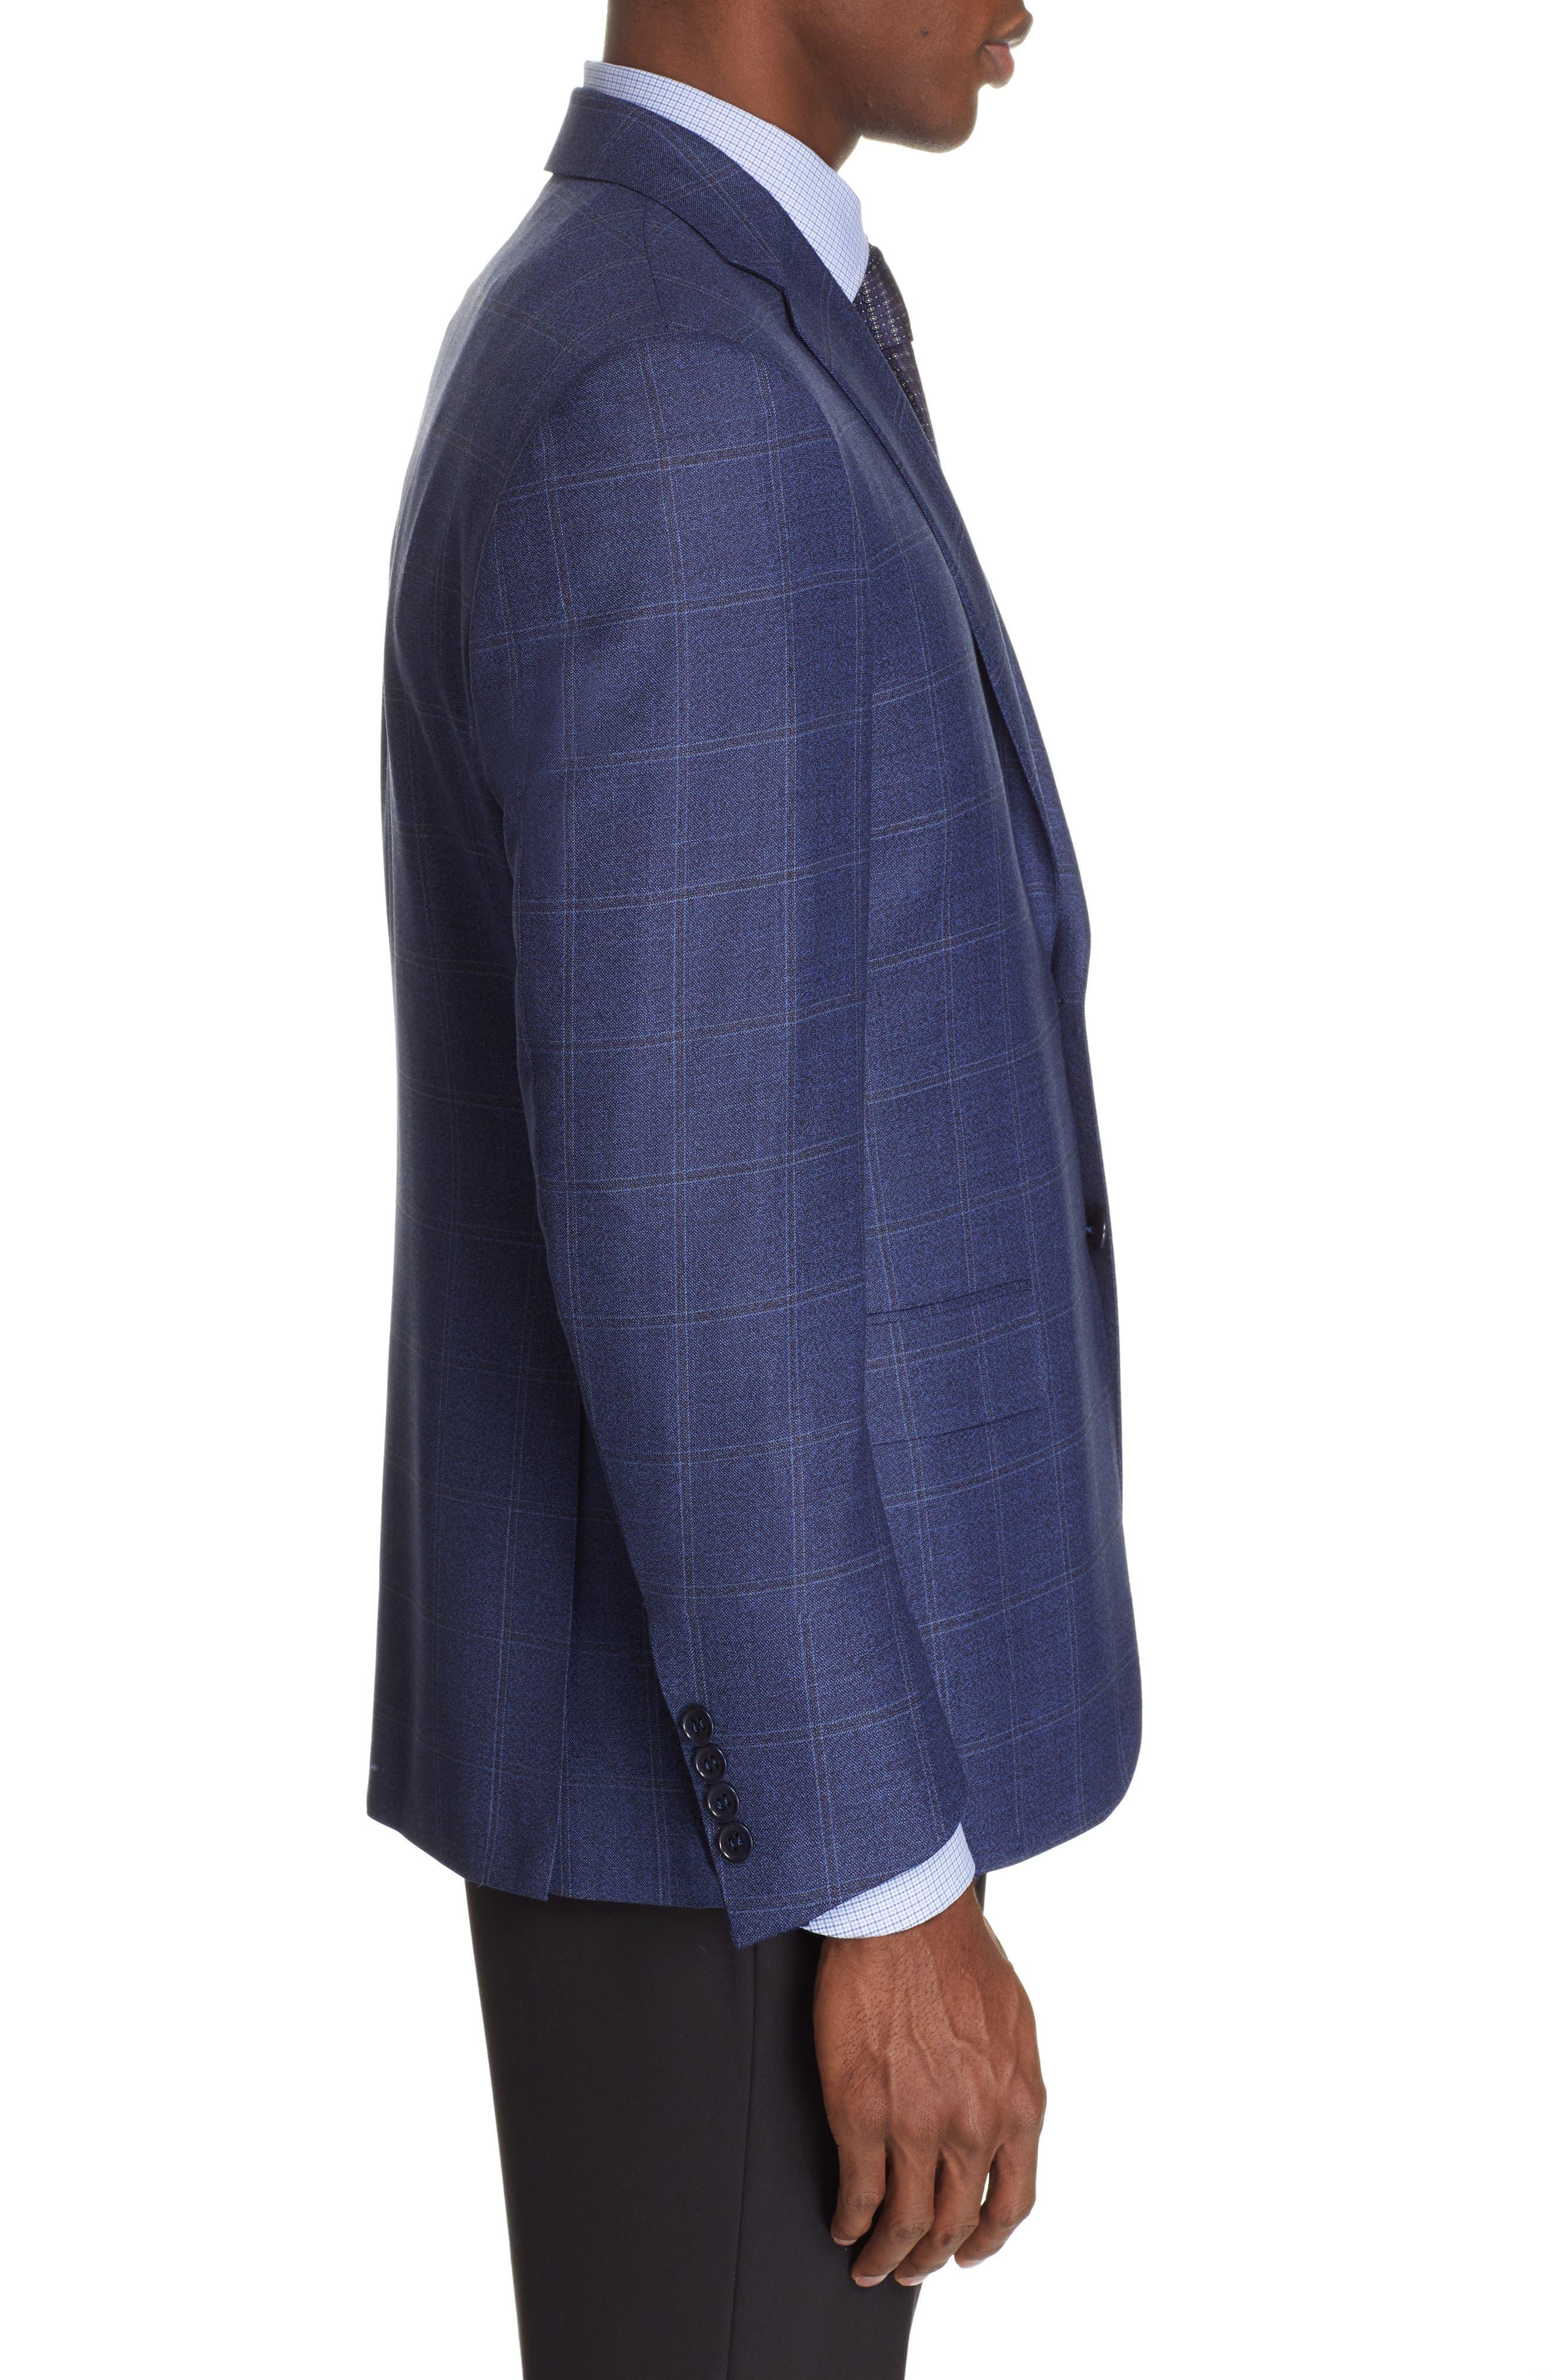 CANALI, Siena Classic Fit Plaid Wool Sport Coat, Alternate thumbnail 3, color, BLUE